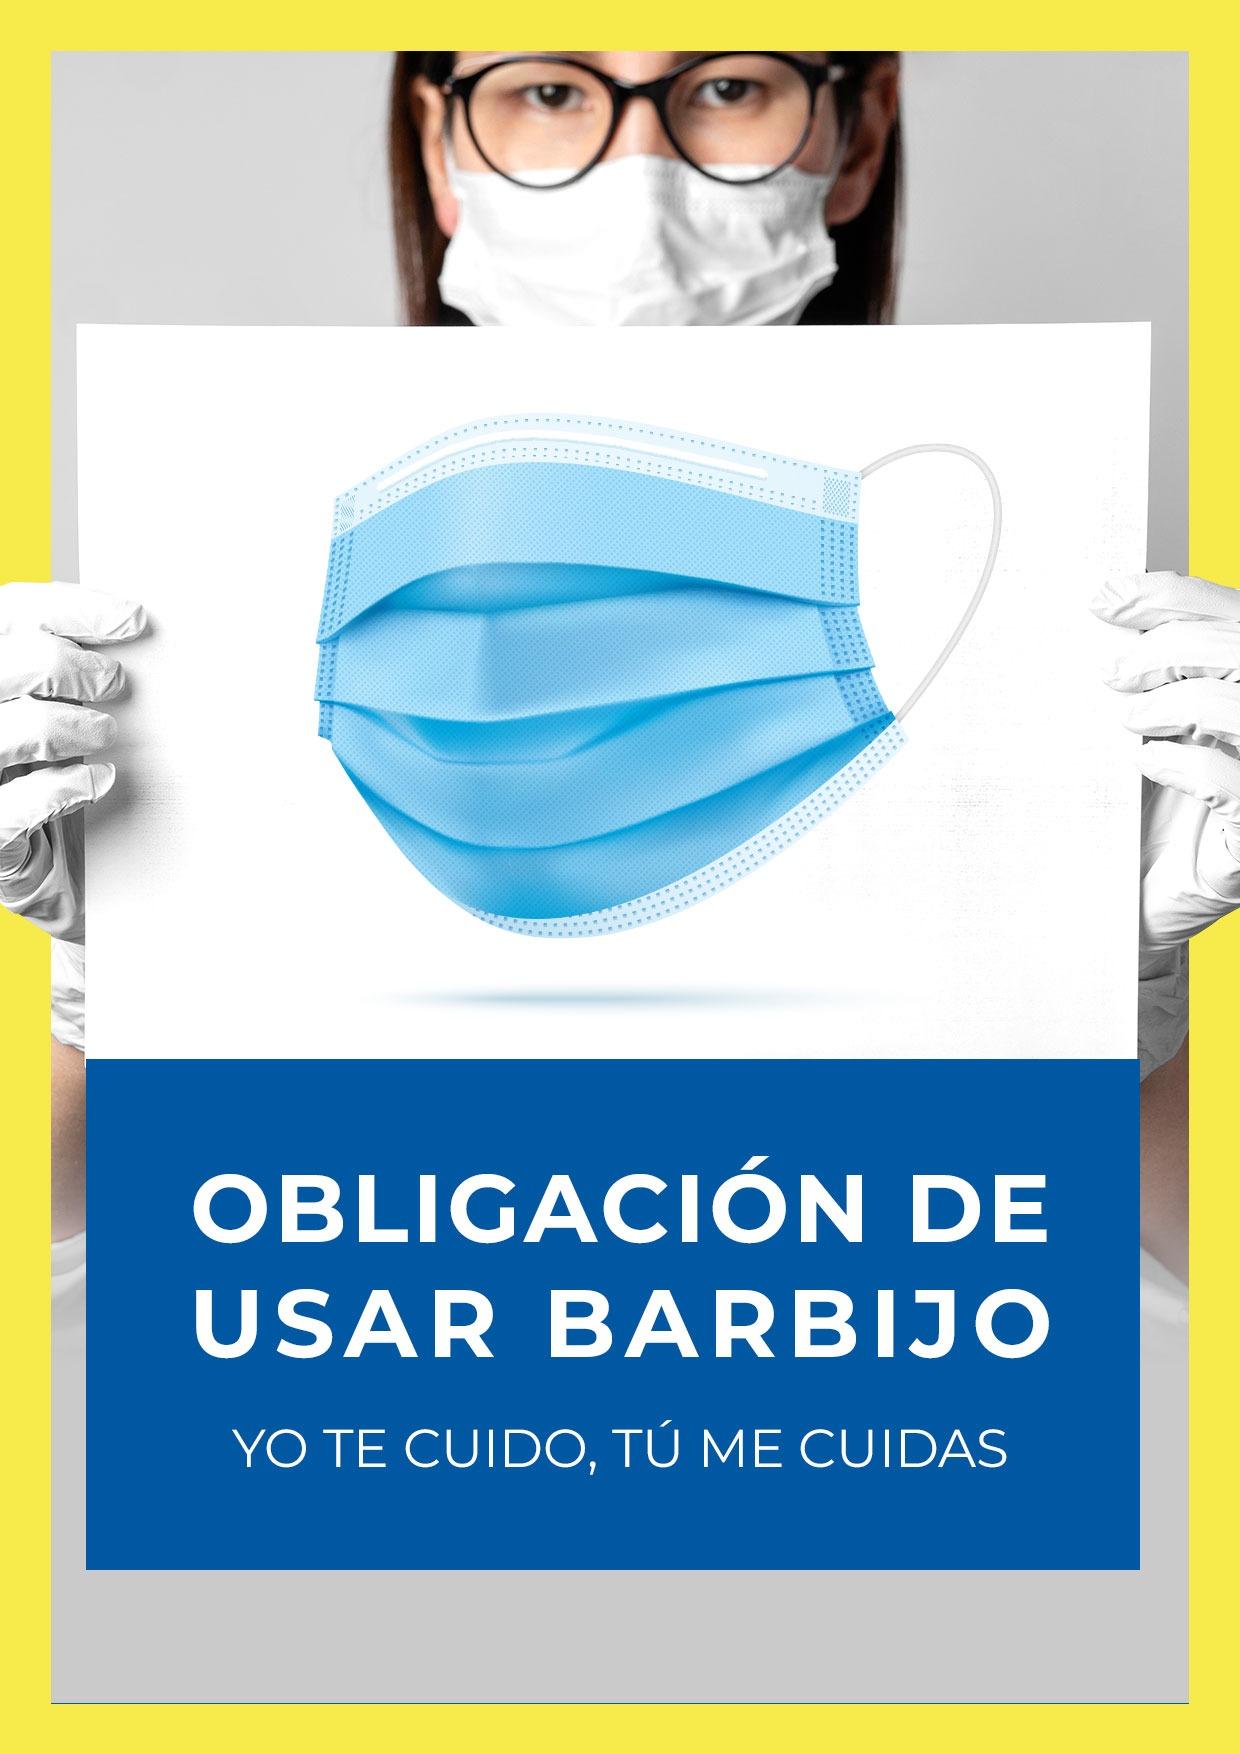 cartel obligacion usar barbijo para imprimir 5